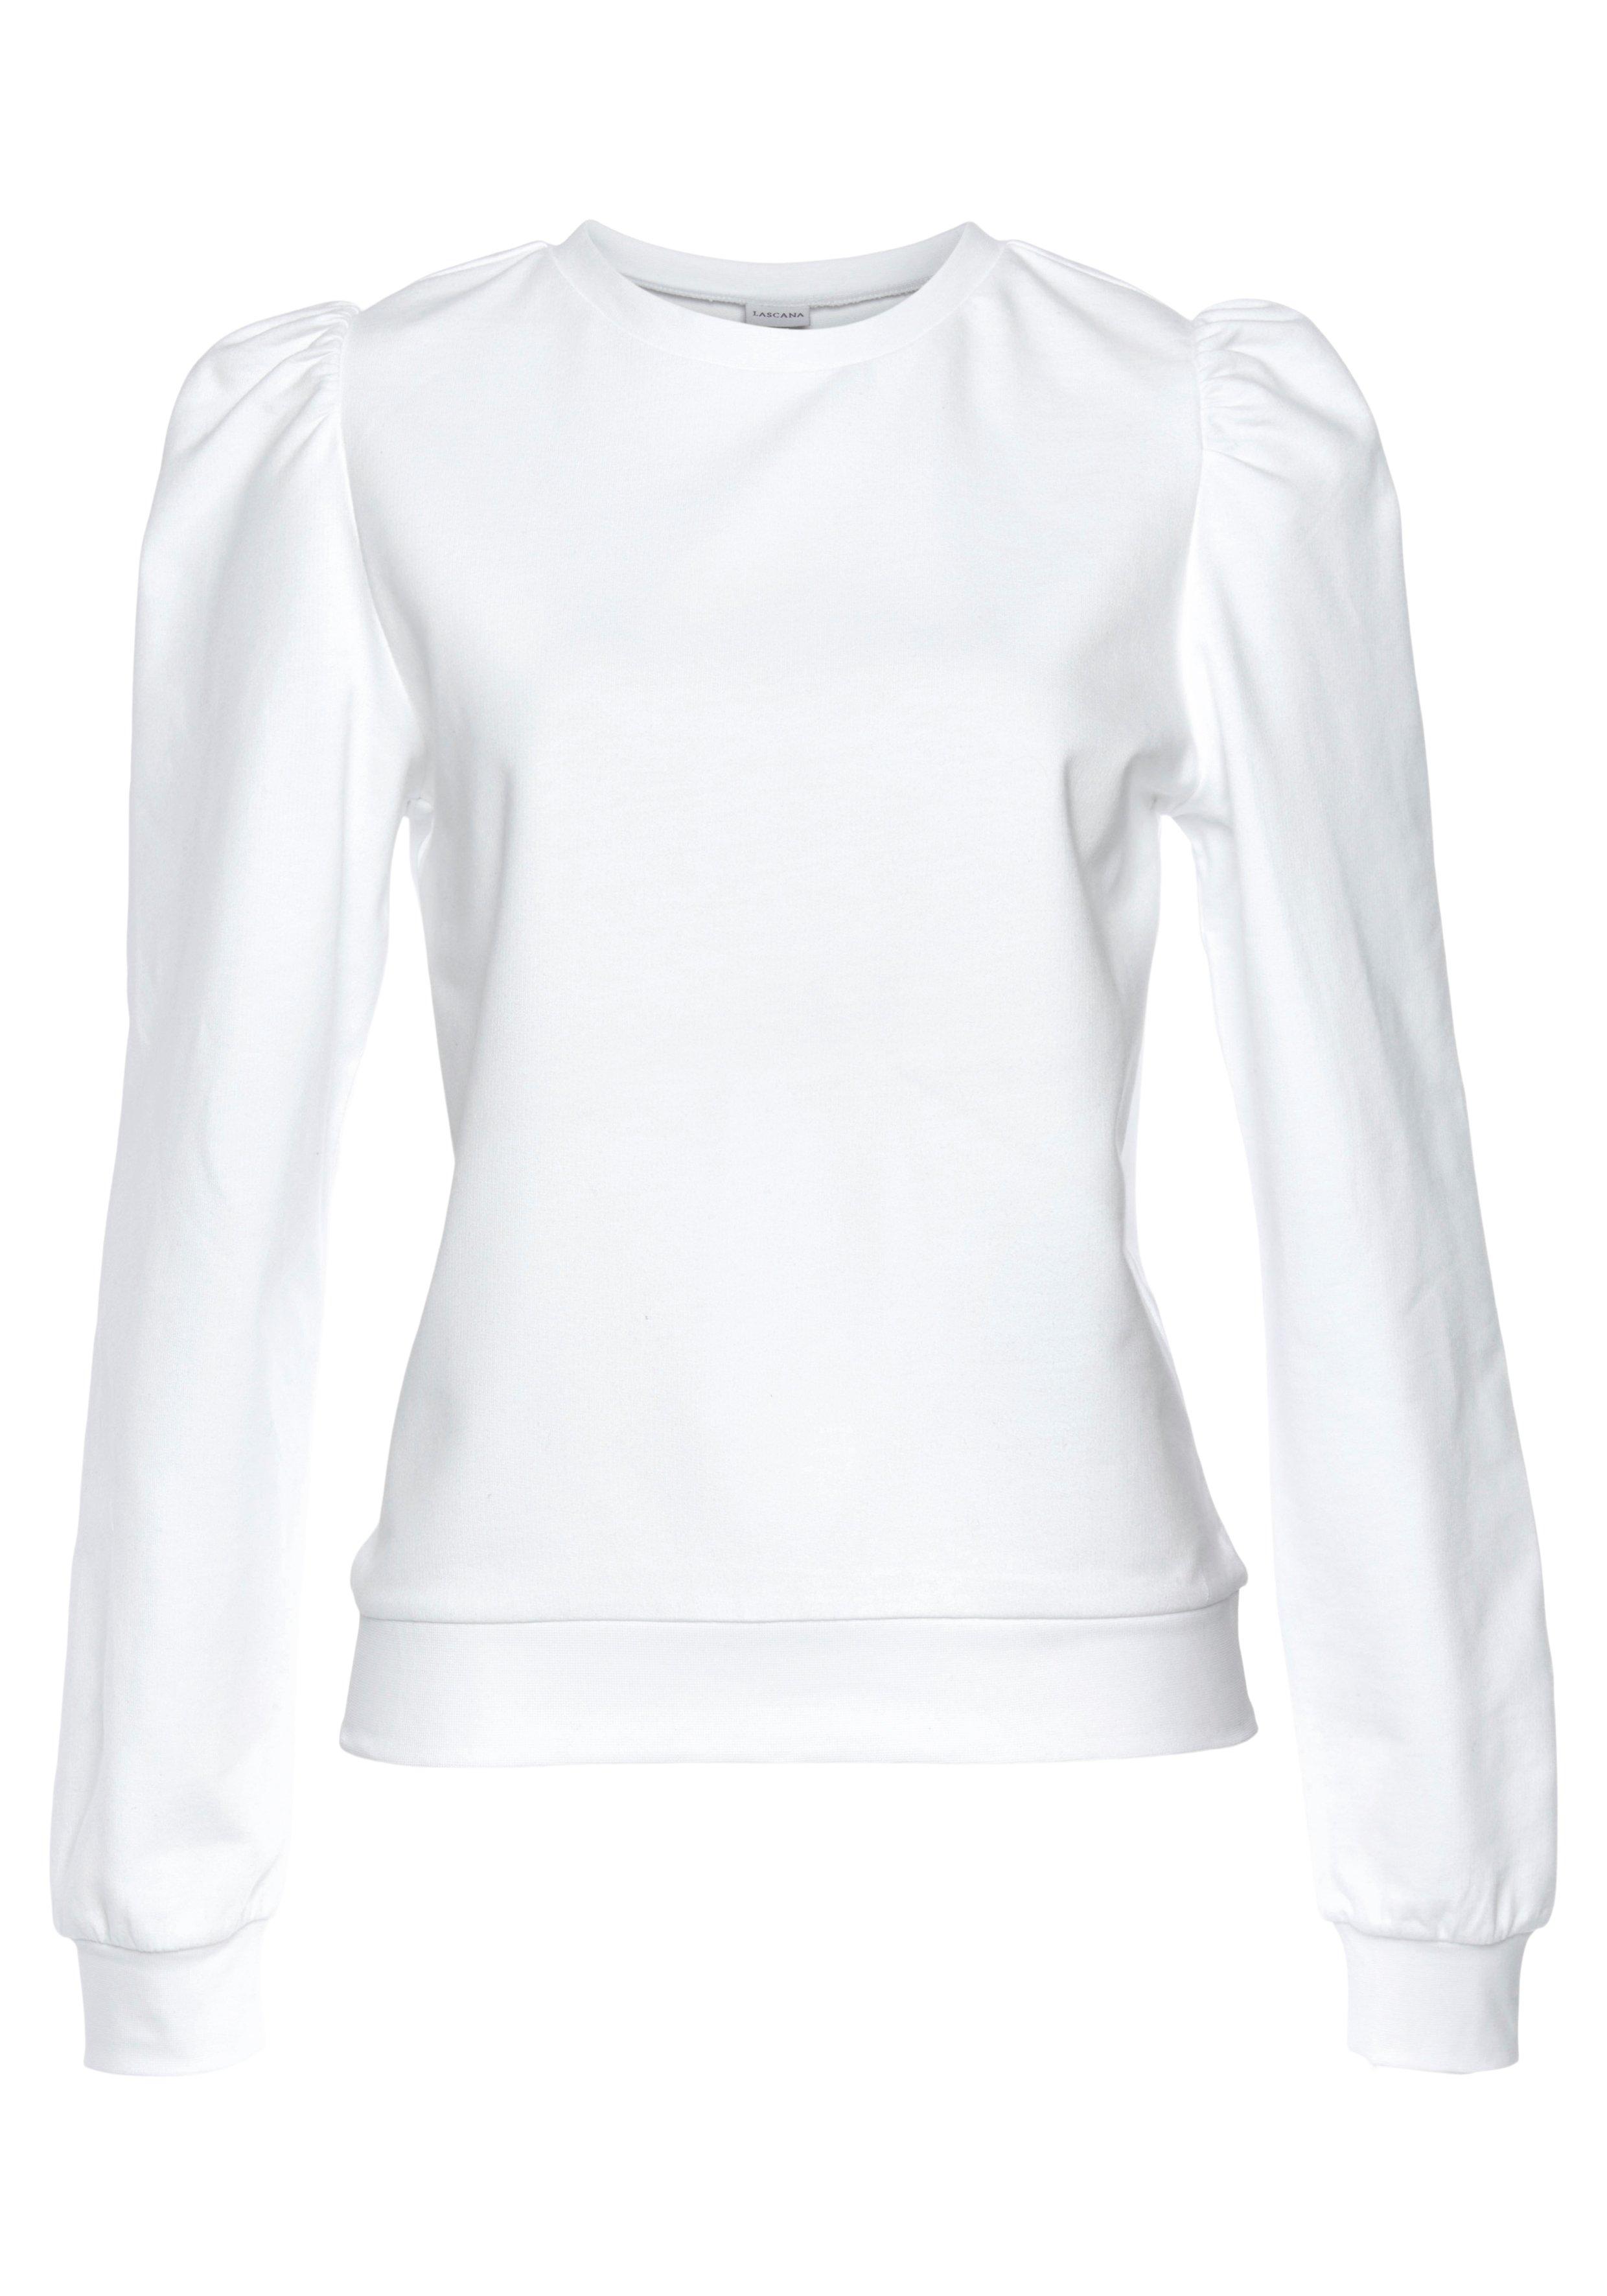 Lascana sweatshirt online kopen op lascana.nl